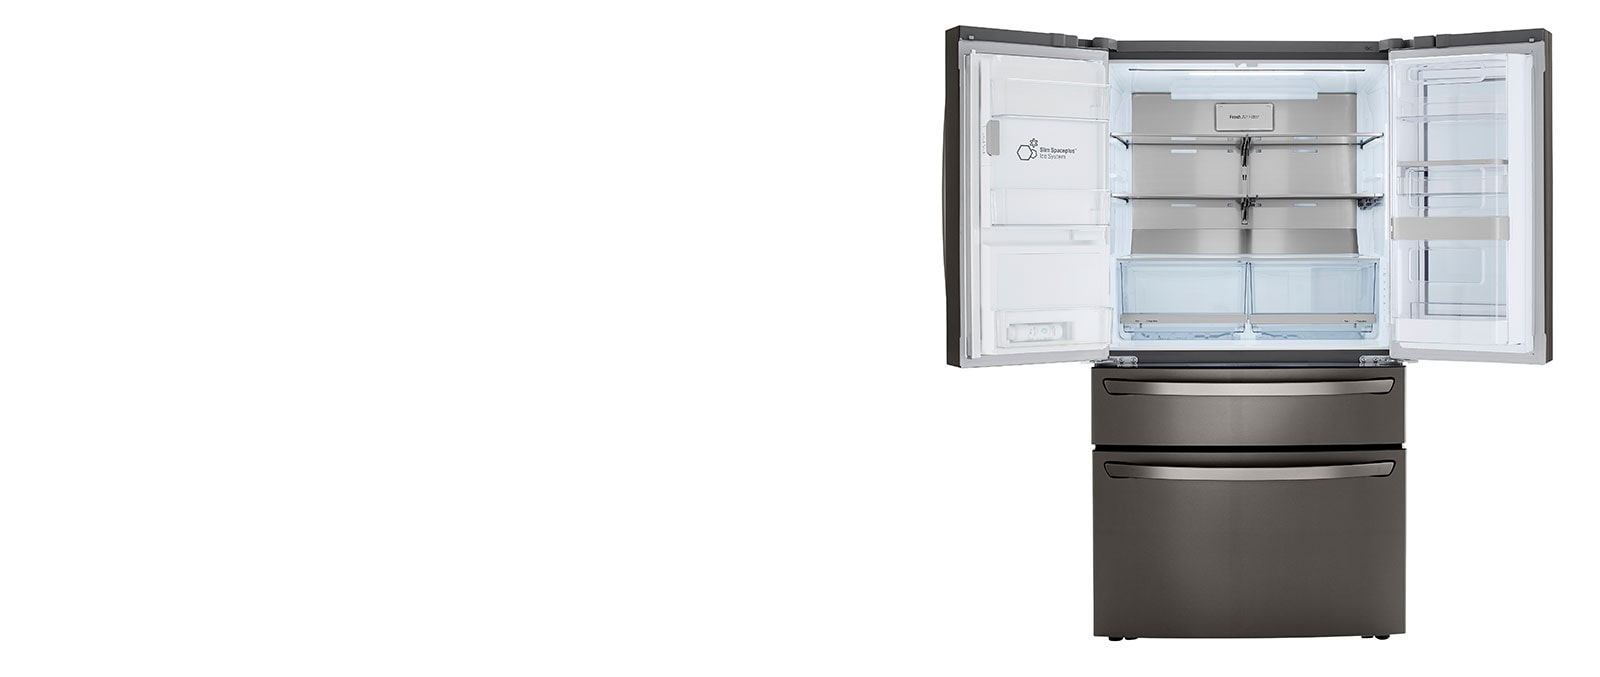 Refrigerator showcasing Counter-depth feature